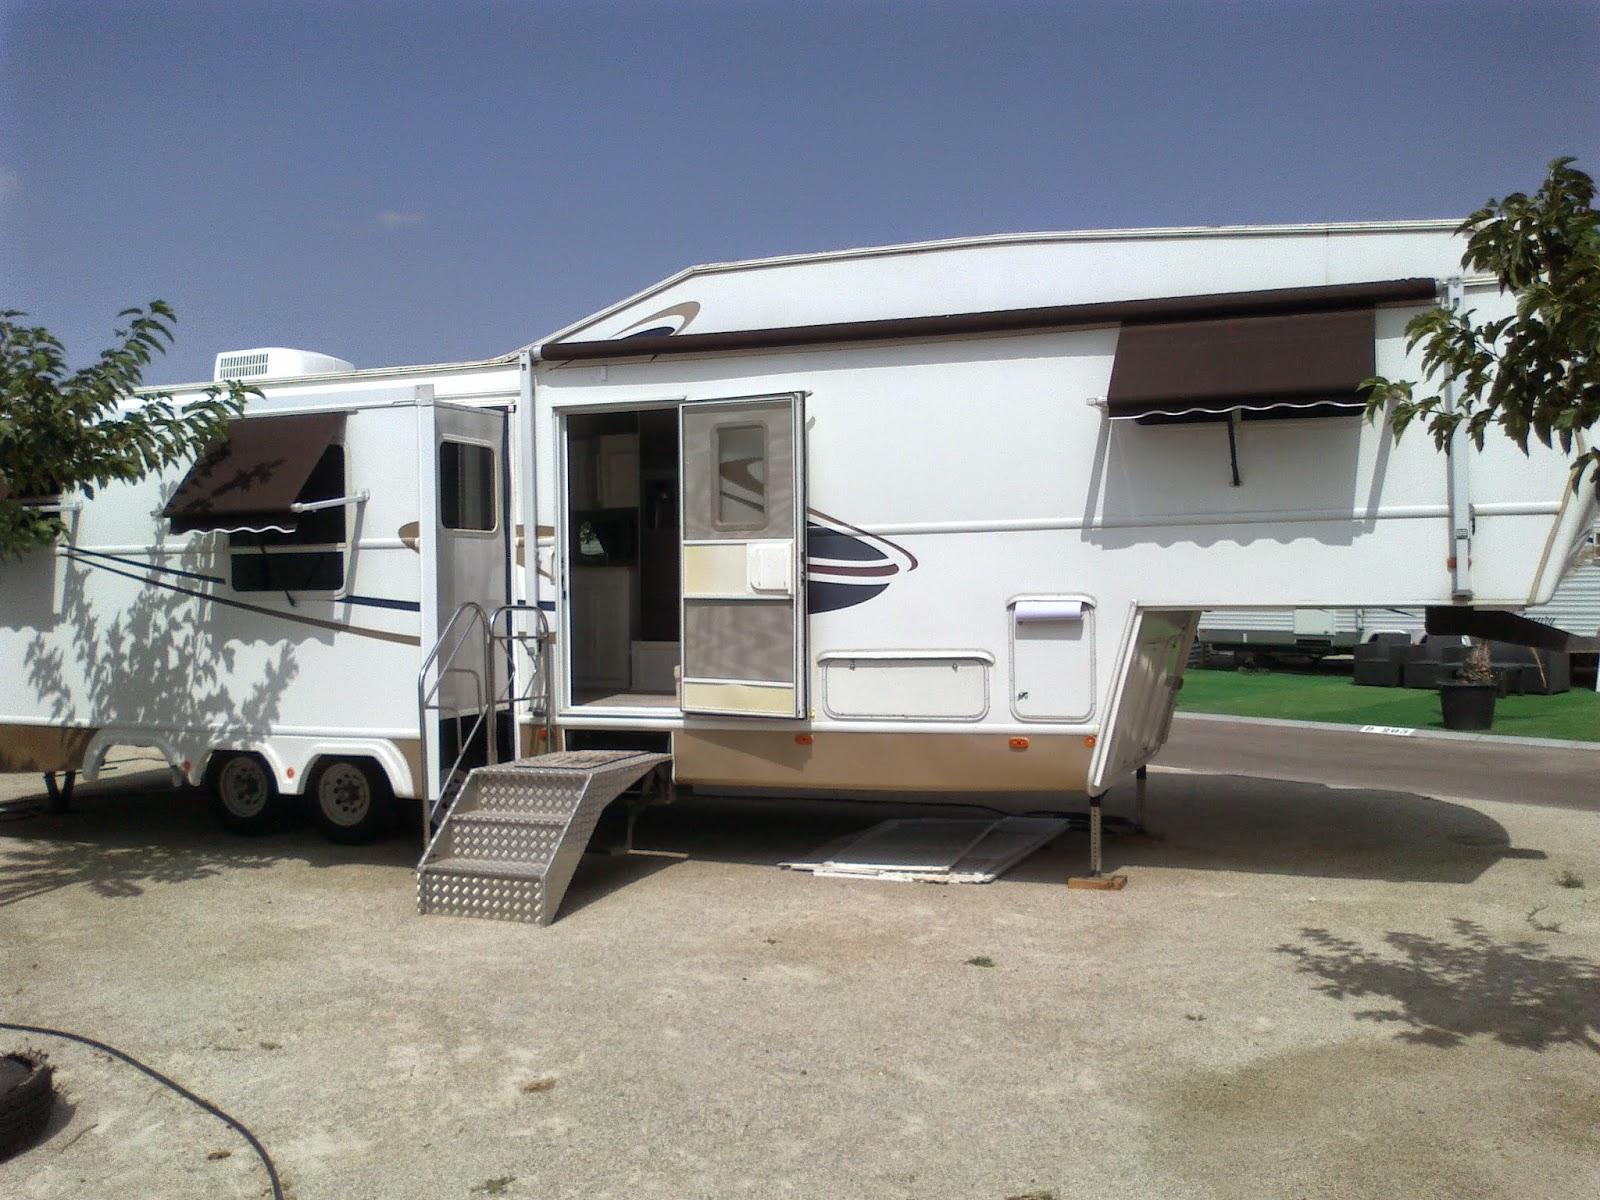 2005 35ft luxury by design 5th wheel caravan for sale s old